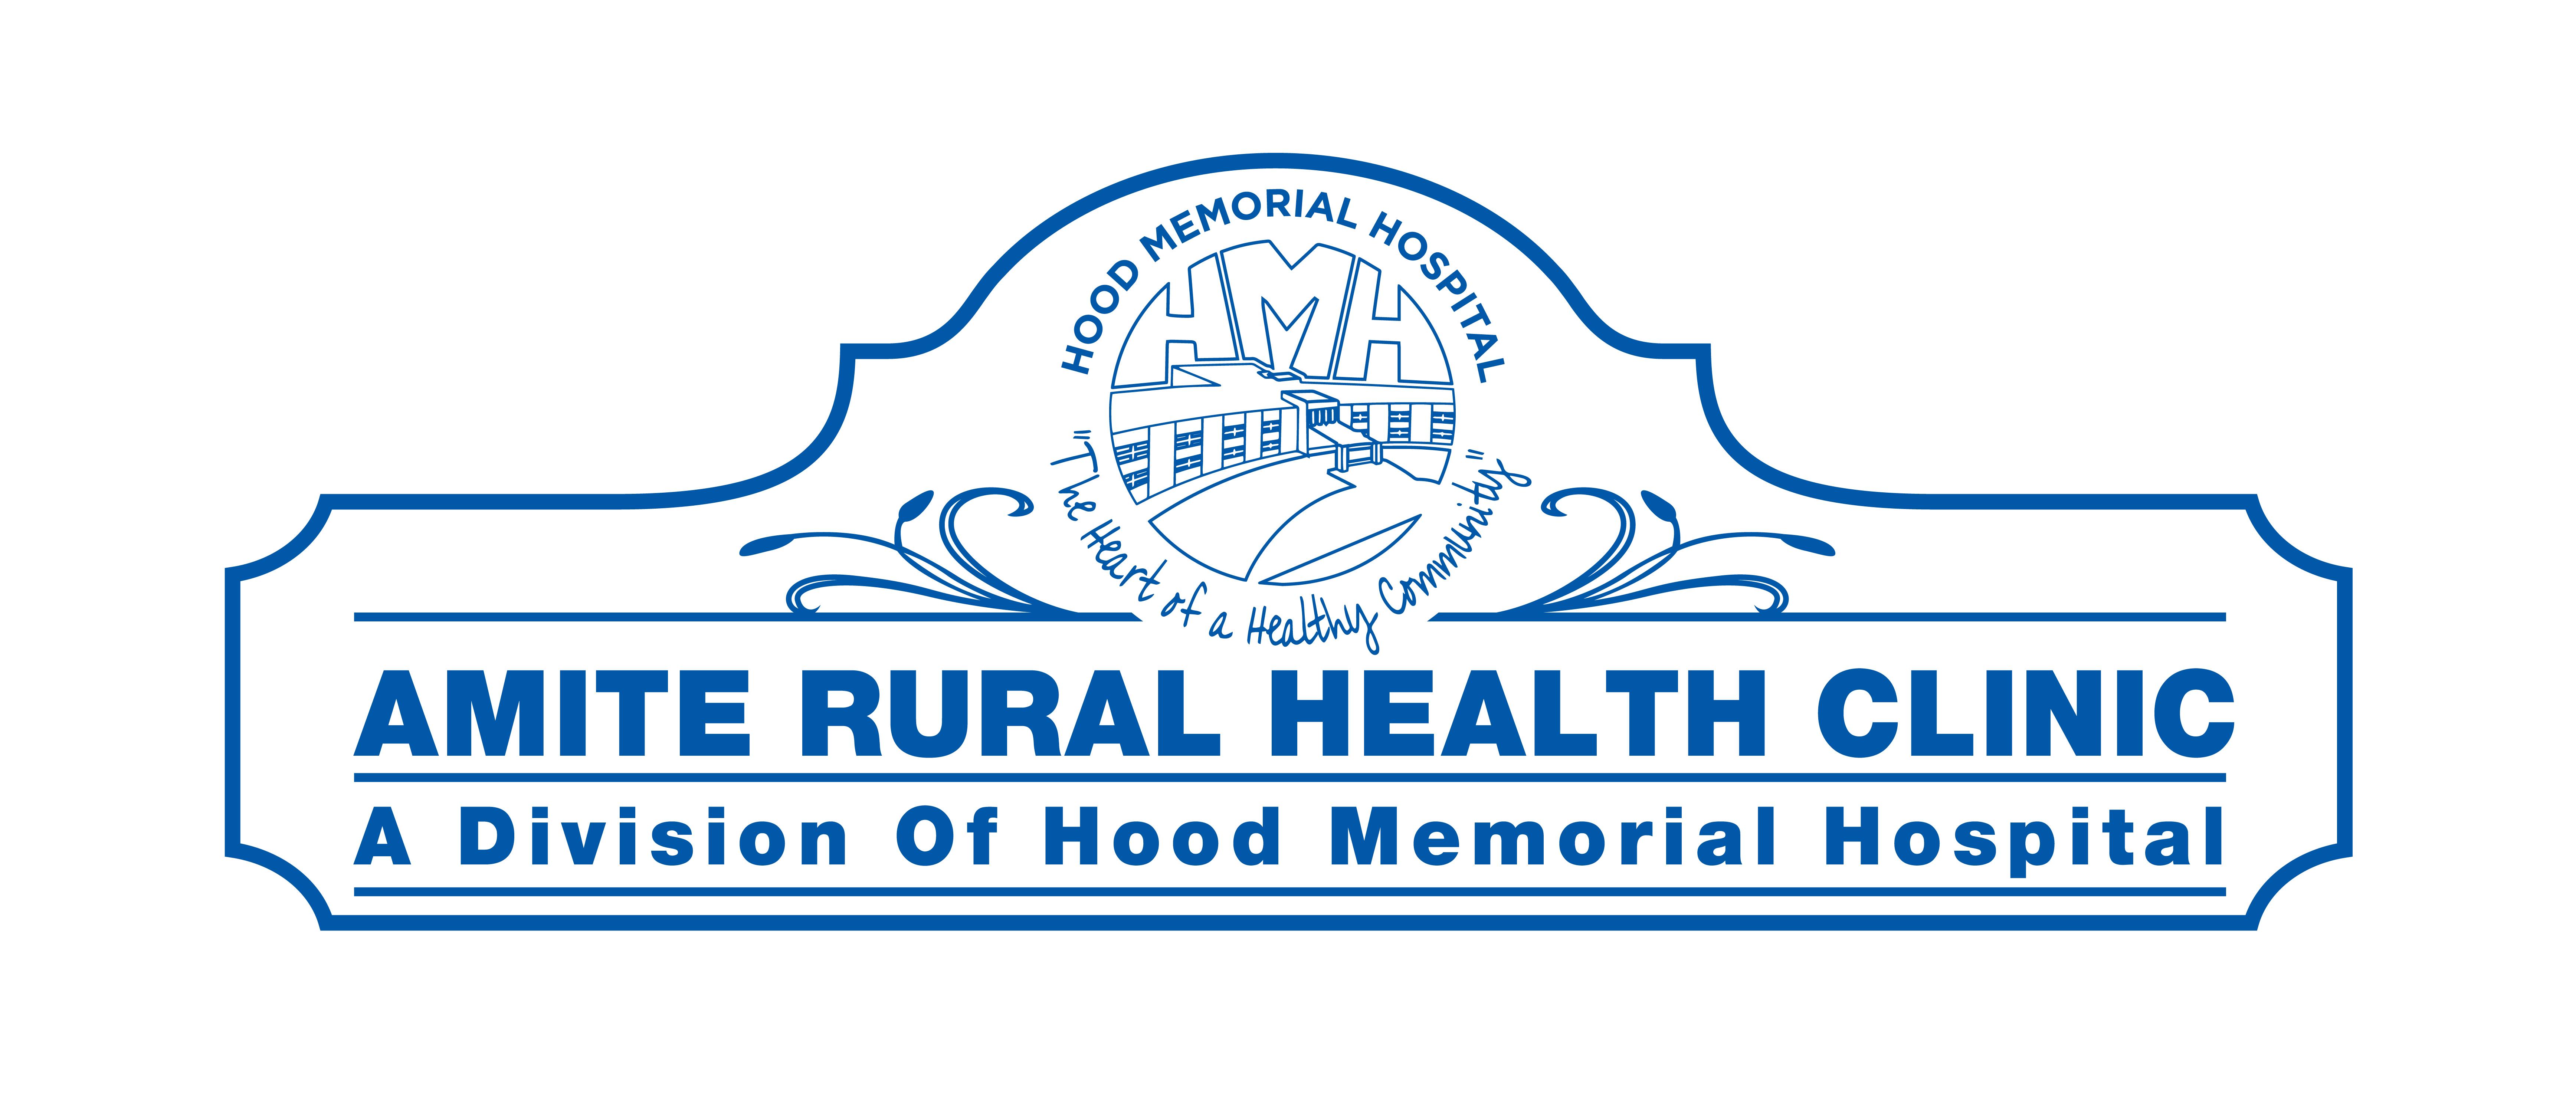 Amite Rural Health Clinic